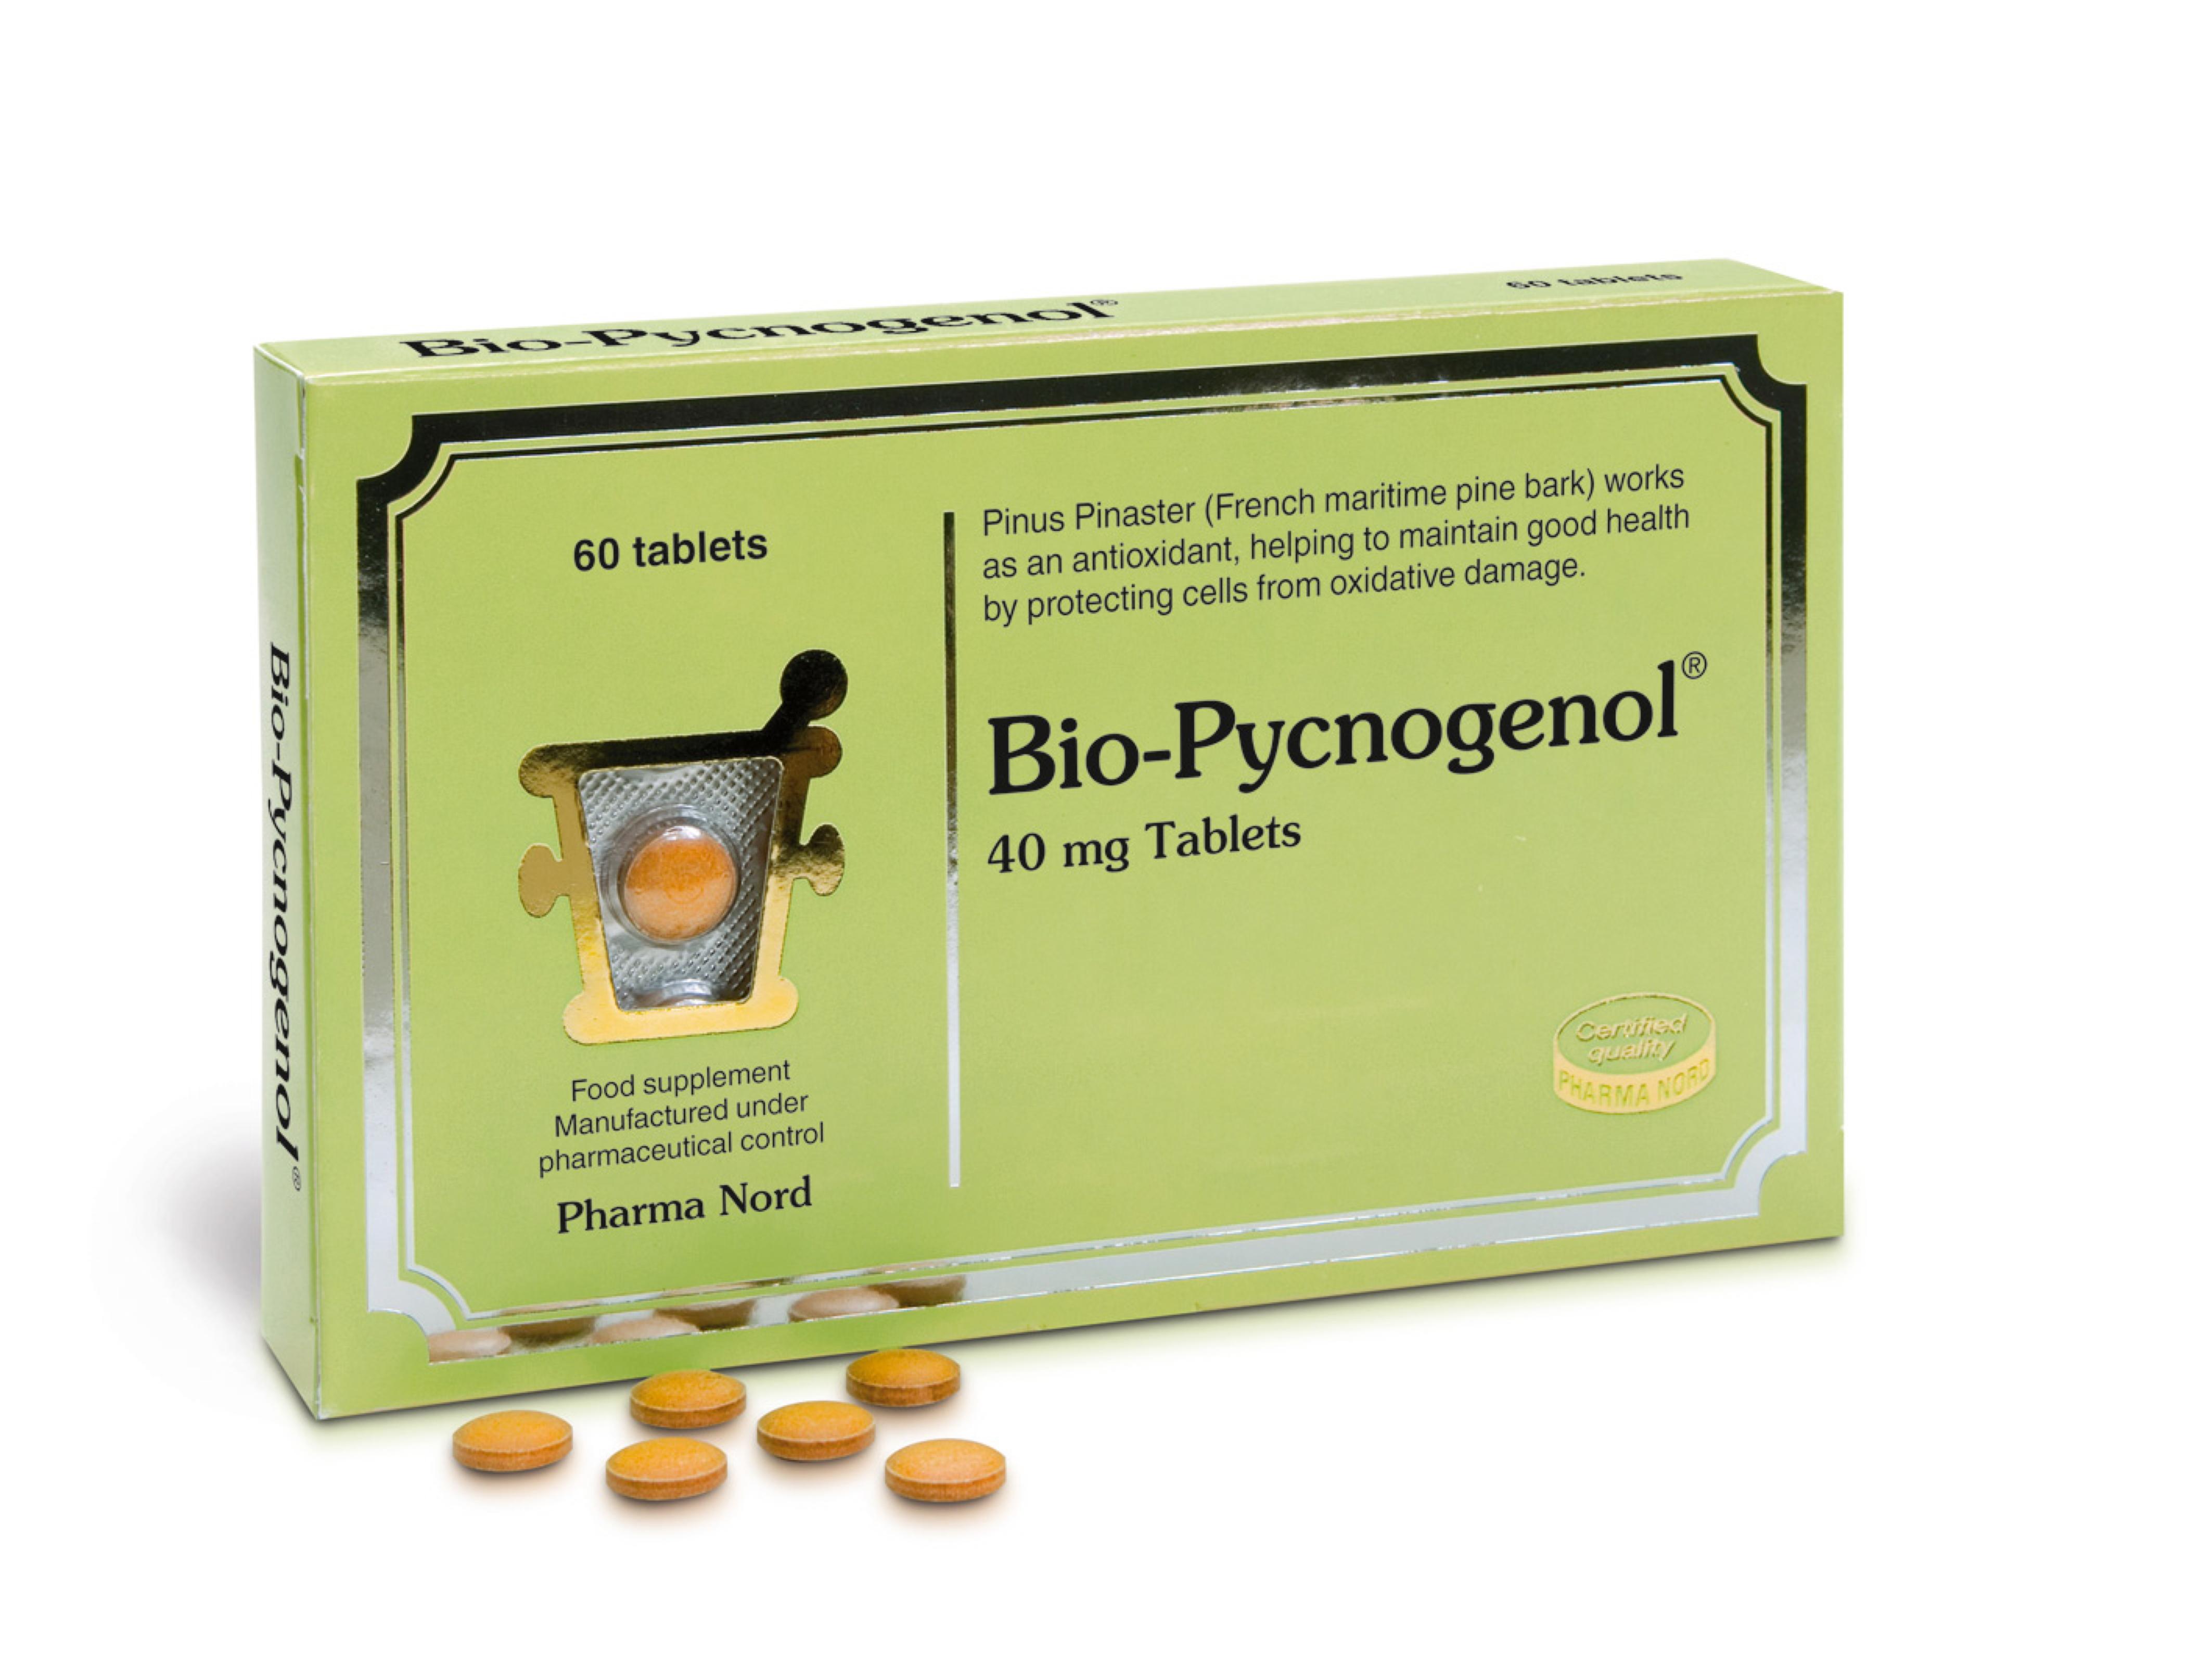 Pharma Nord BioPycnogenol 60 comprimés 33,95€ ©Pycnogénol (1)